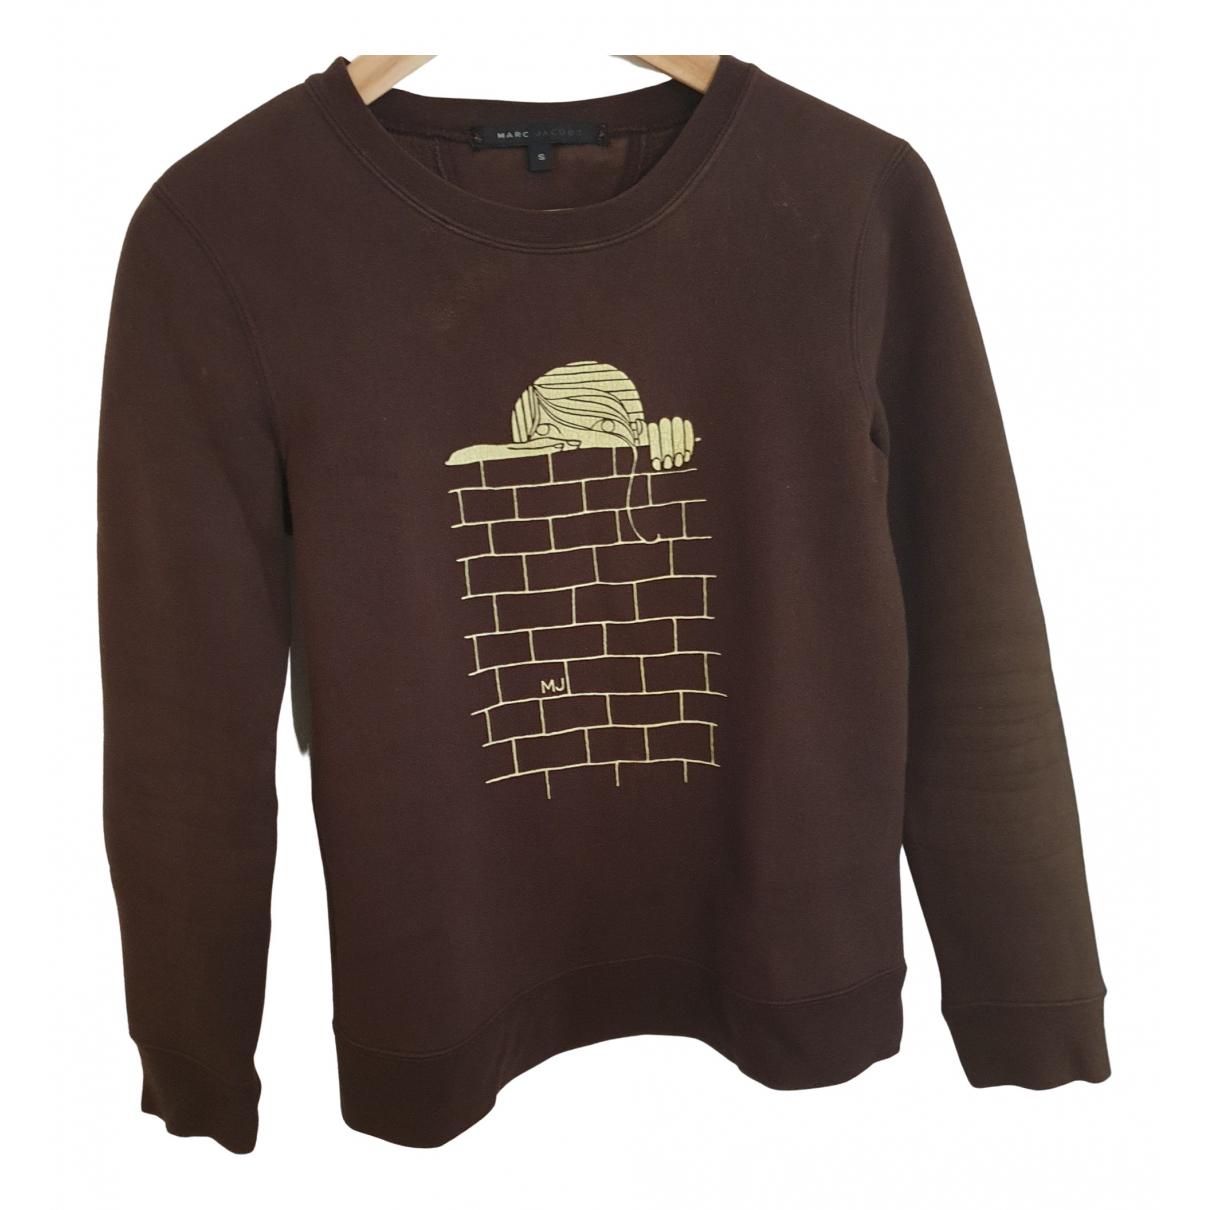 Marc Jacobs \N Brown Cotton Knitwear for Women S International